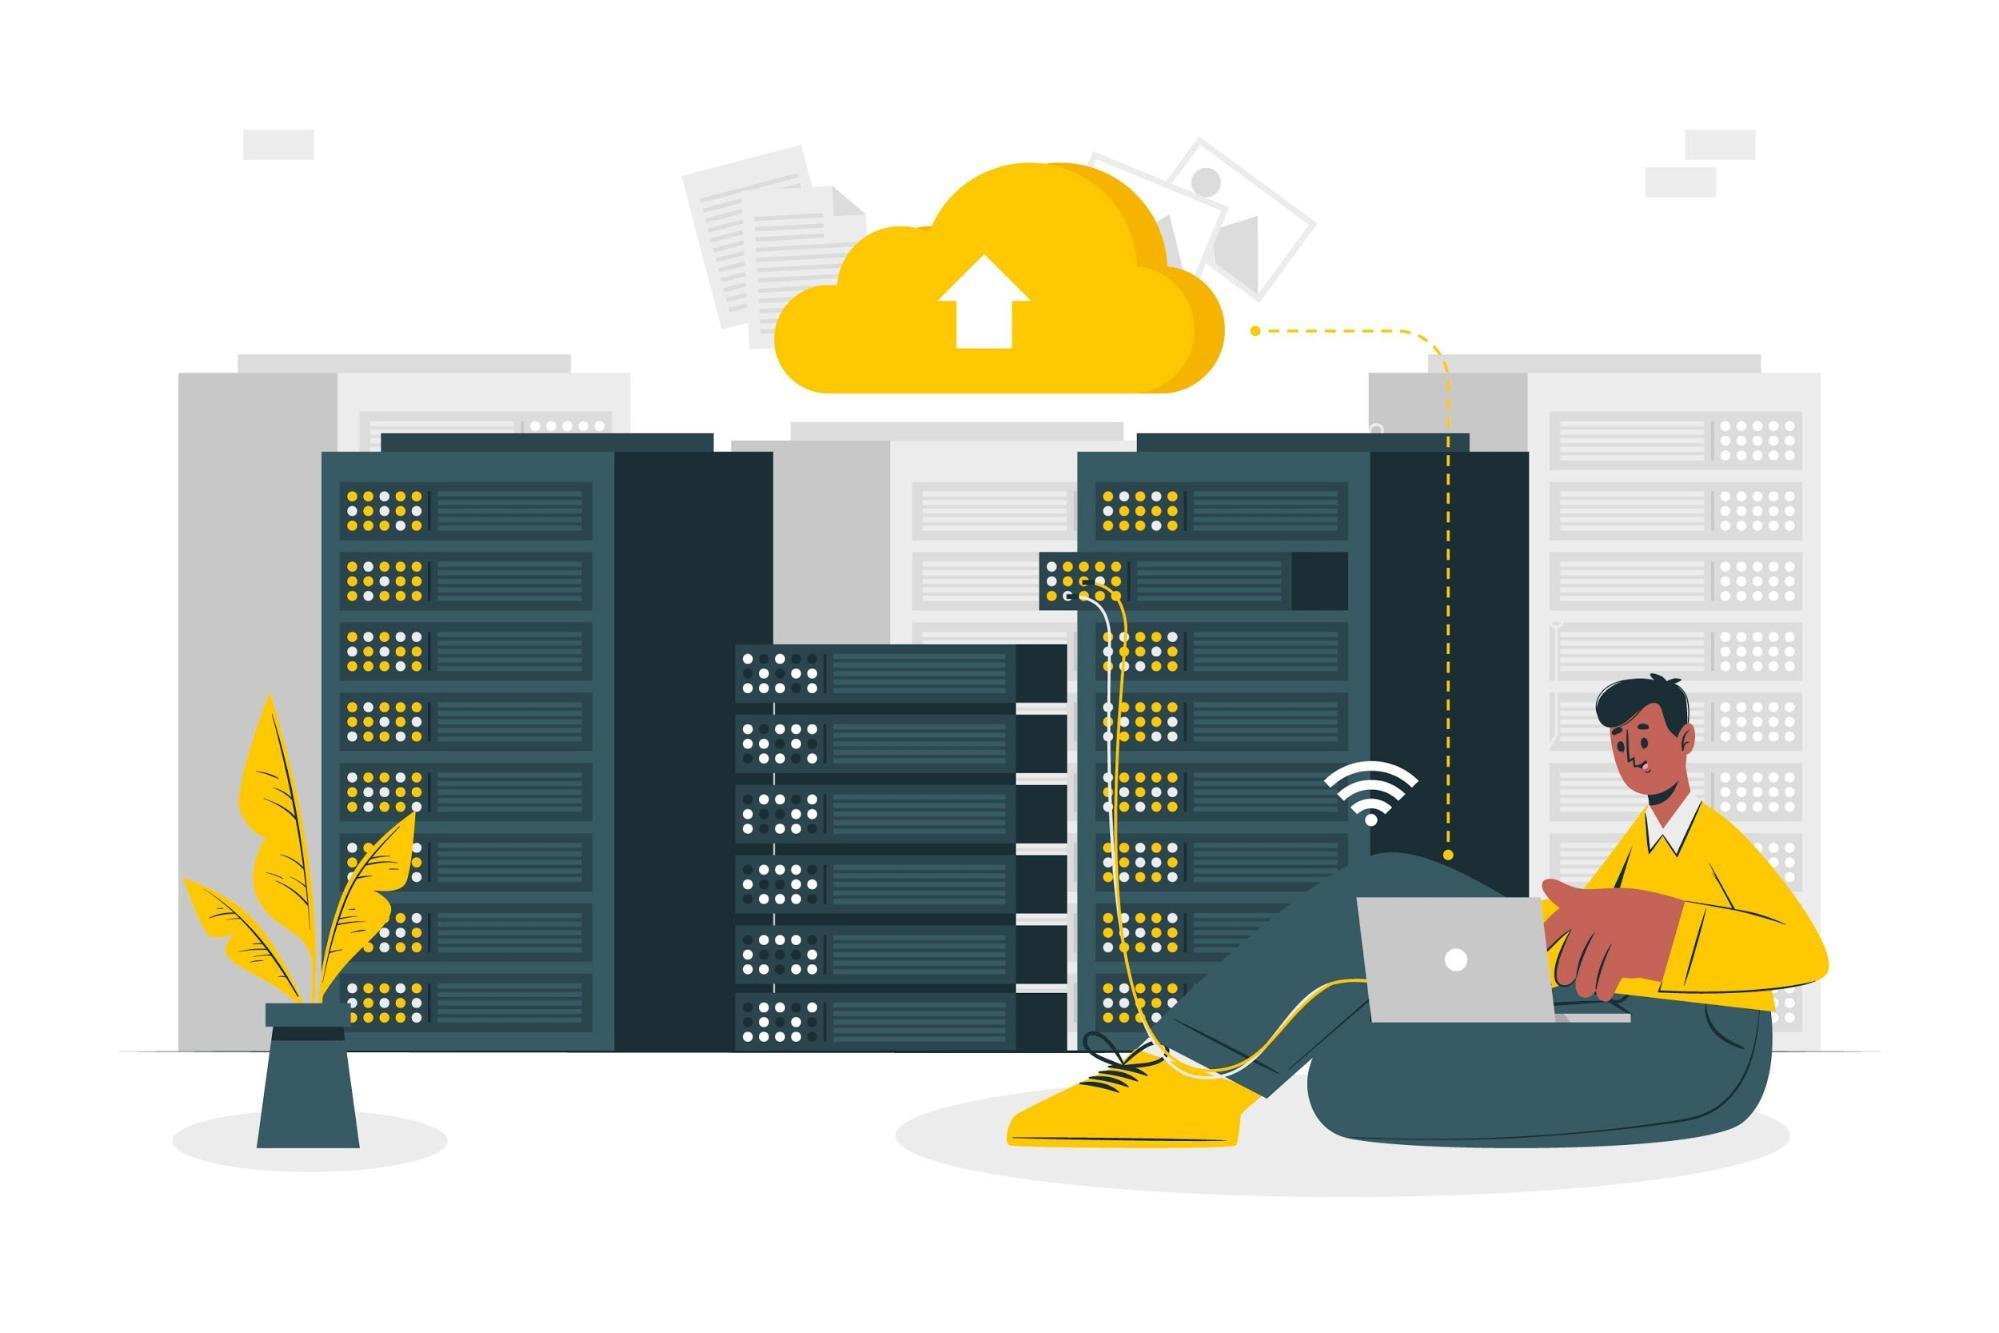 huge-centralized-database-structure